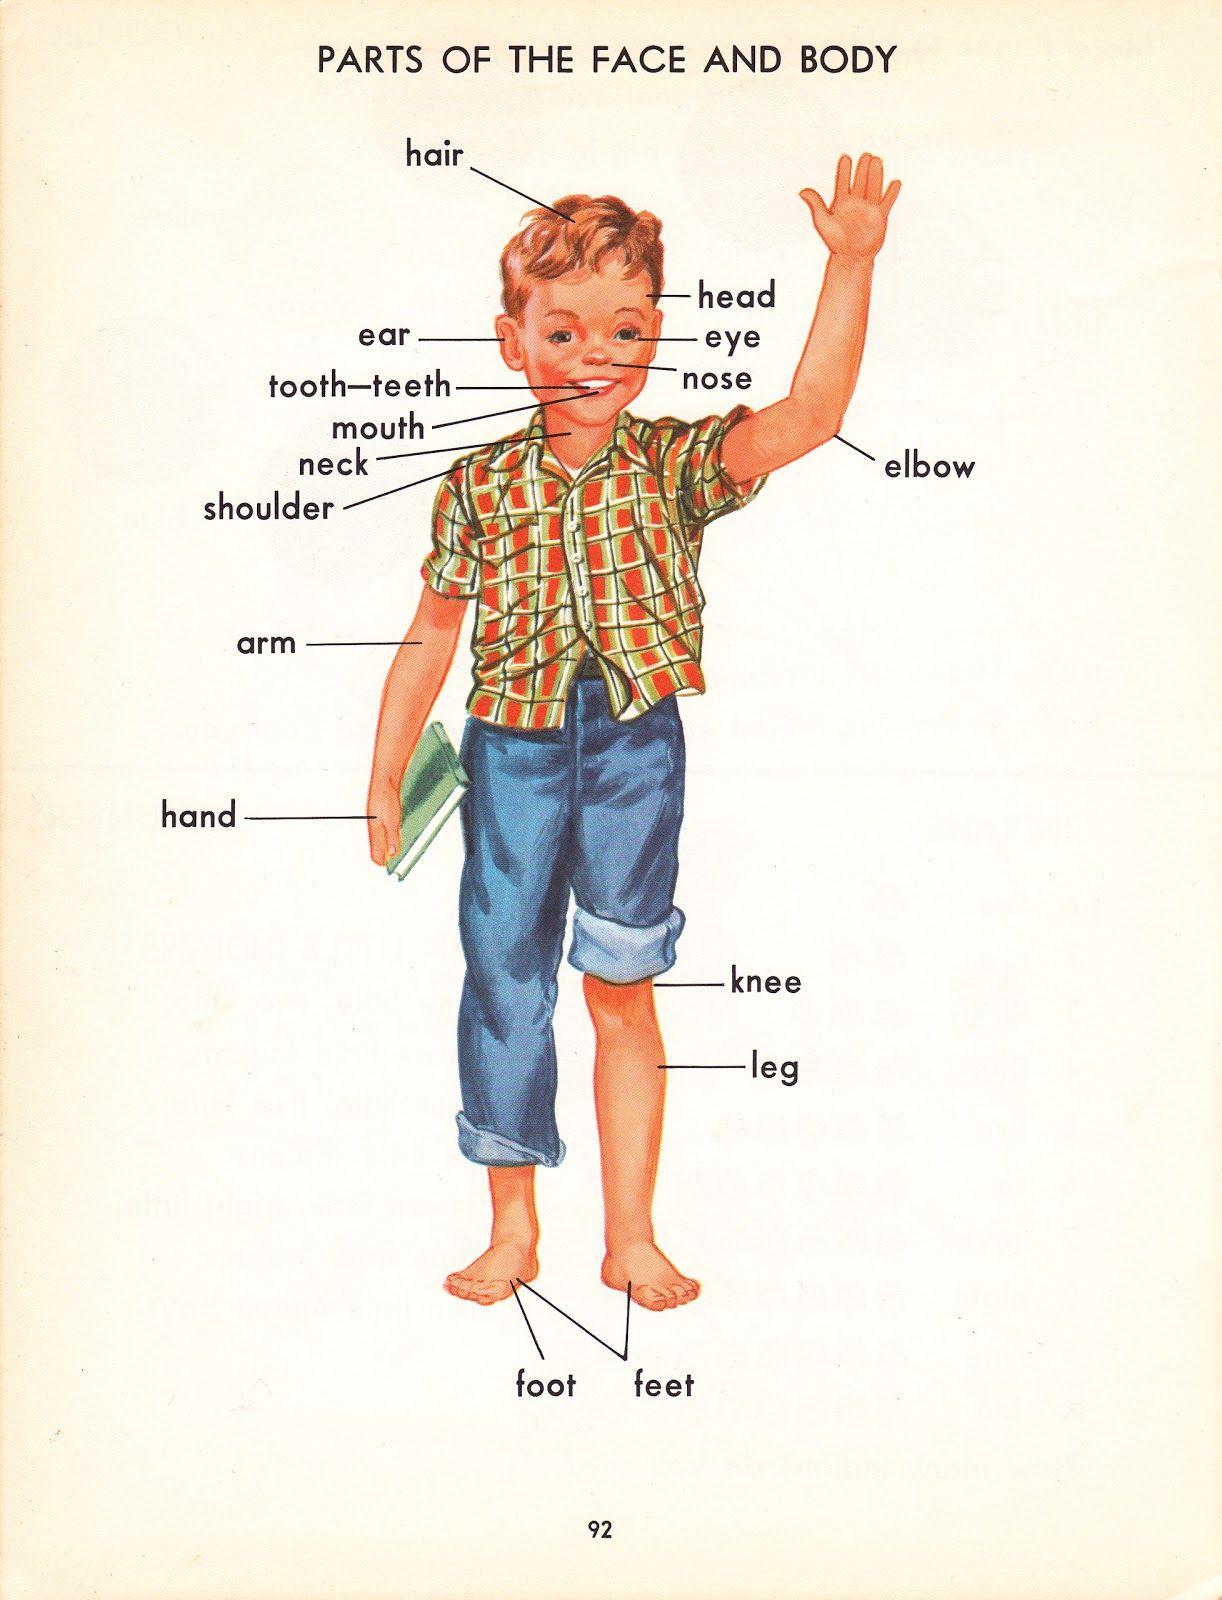 Human Part Body Name Body Parts